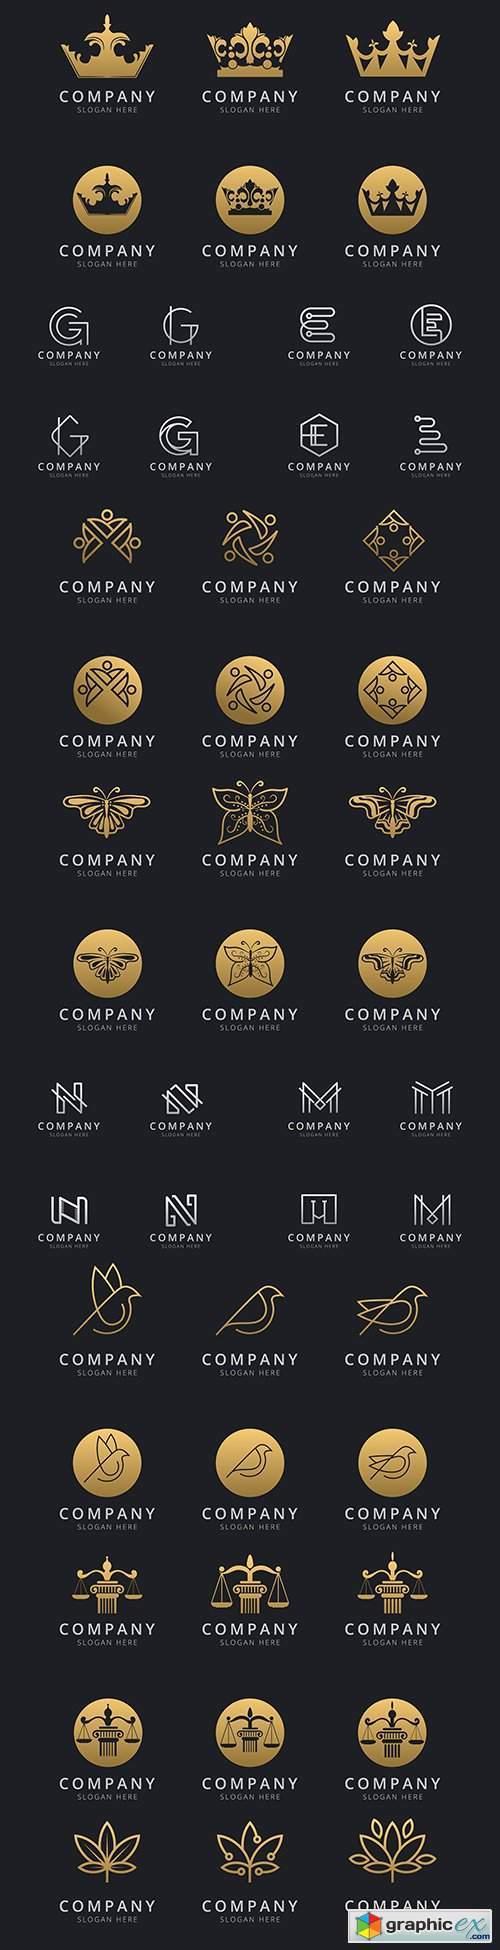 Brand name company logos business corporate design 36